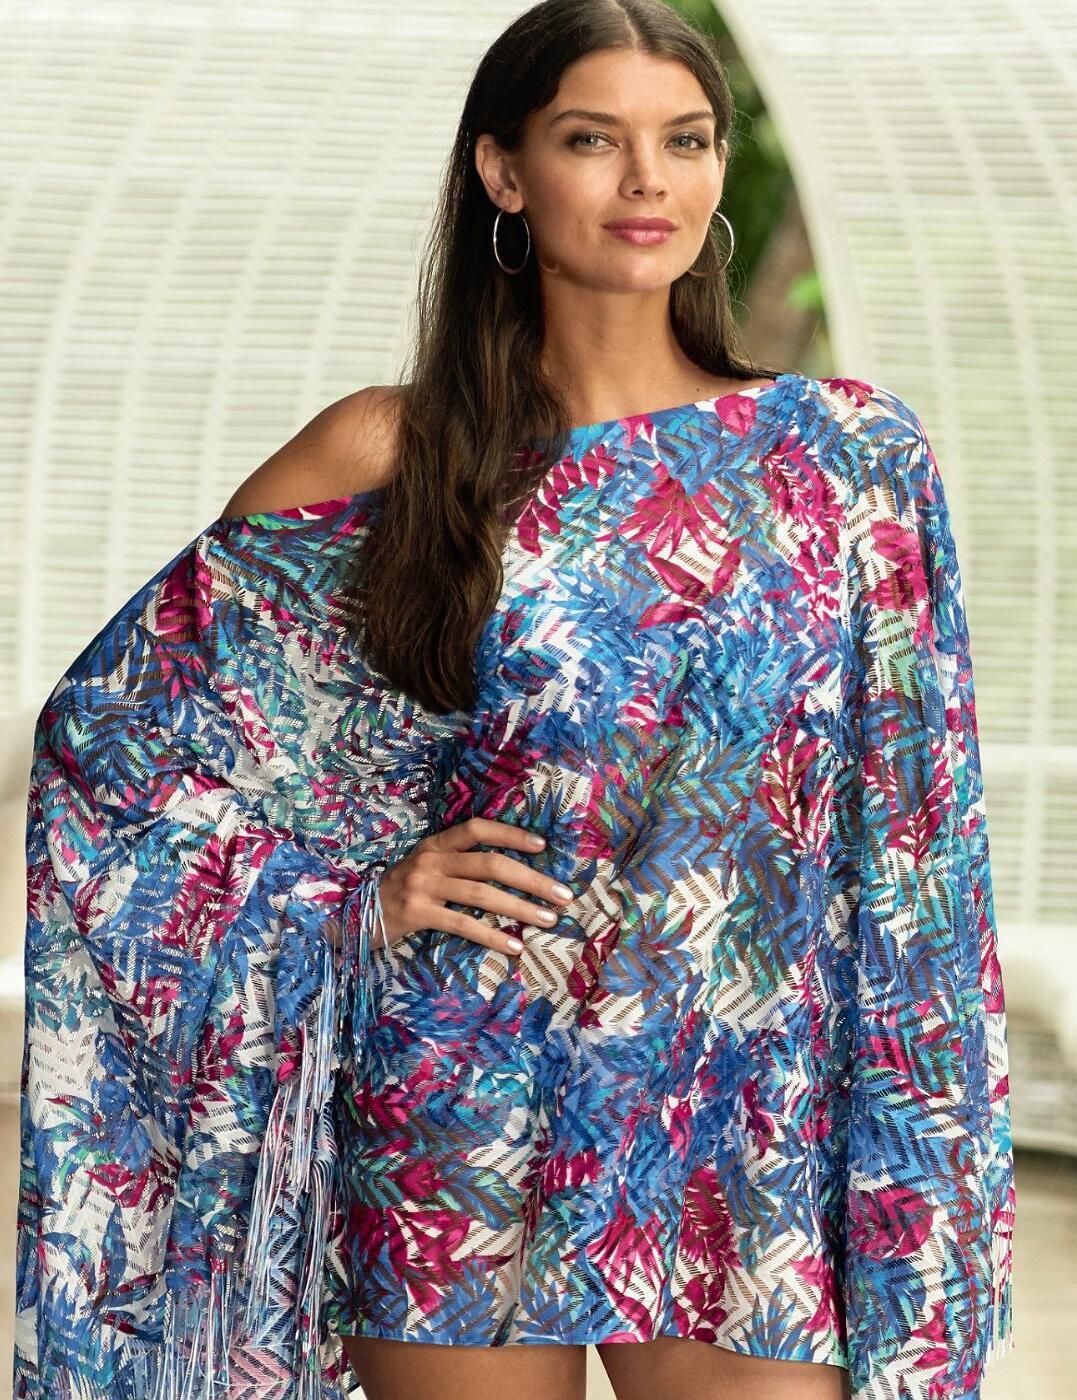 8638 Anita Naila Poncho Beachdress Cover up - 8638 Original (Multi Print)